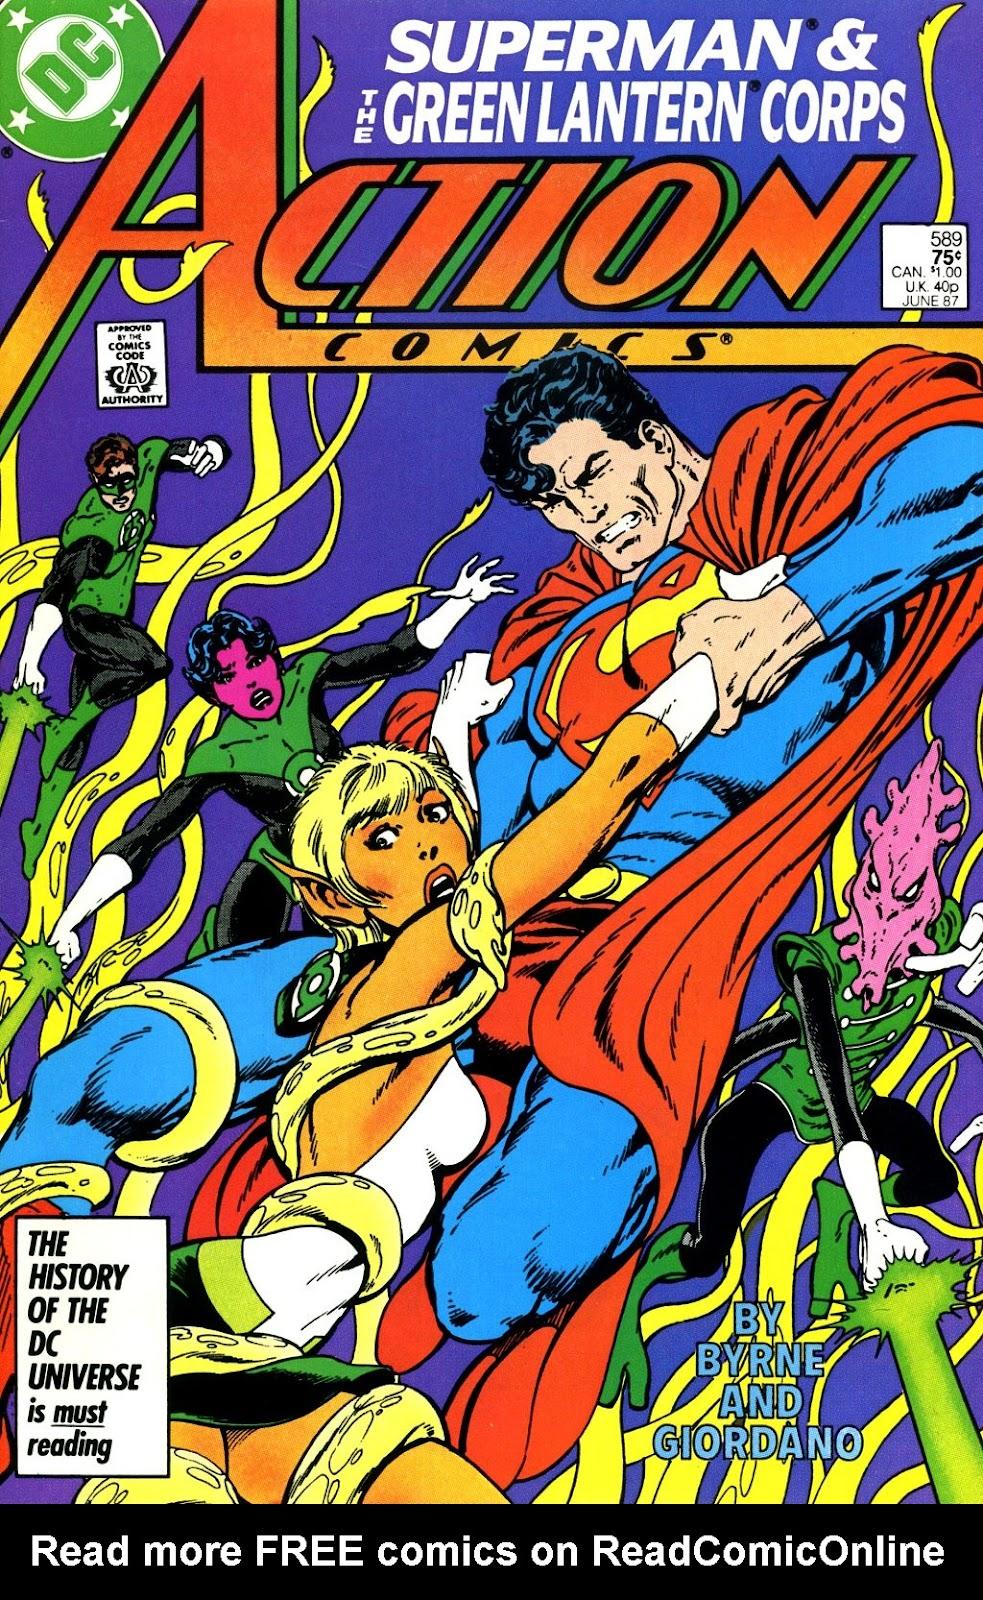 Action Comics (1938) 589 Page 1